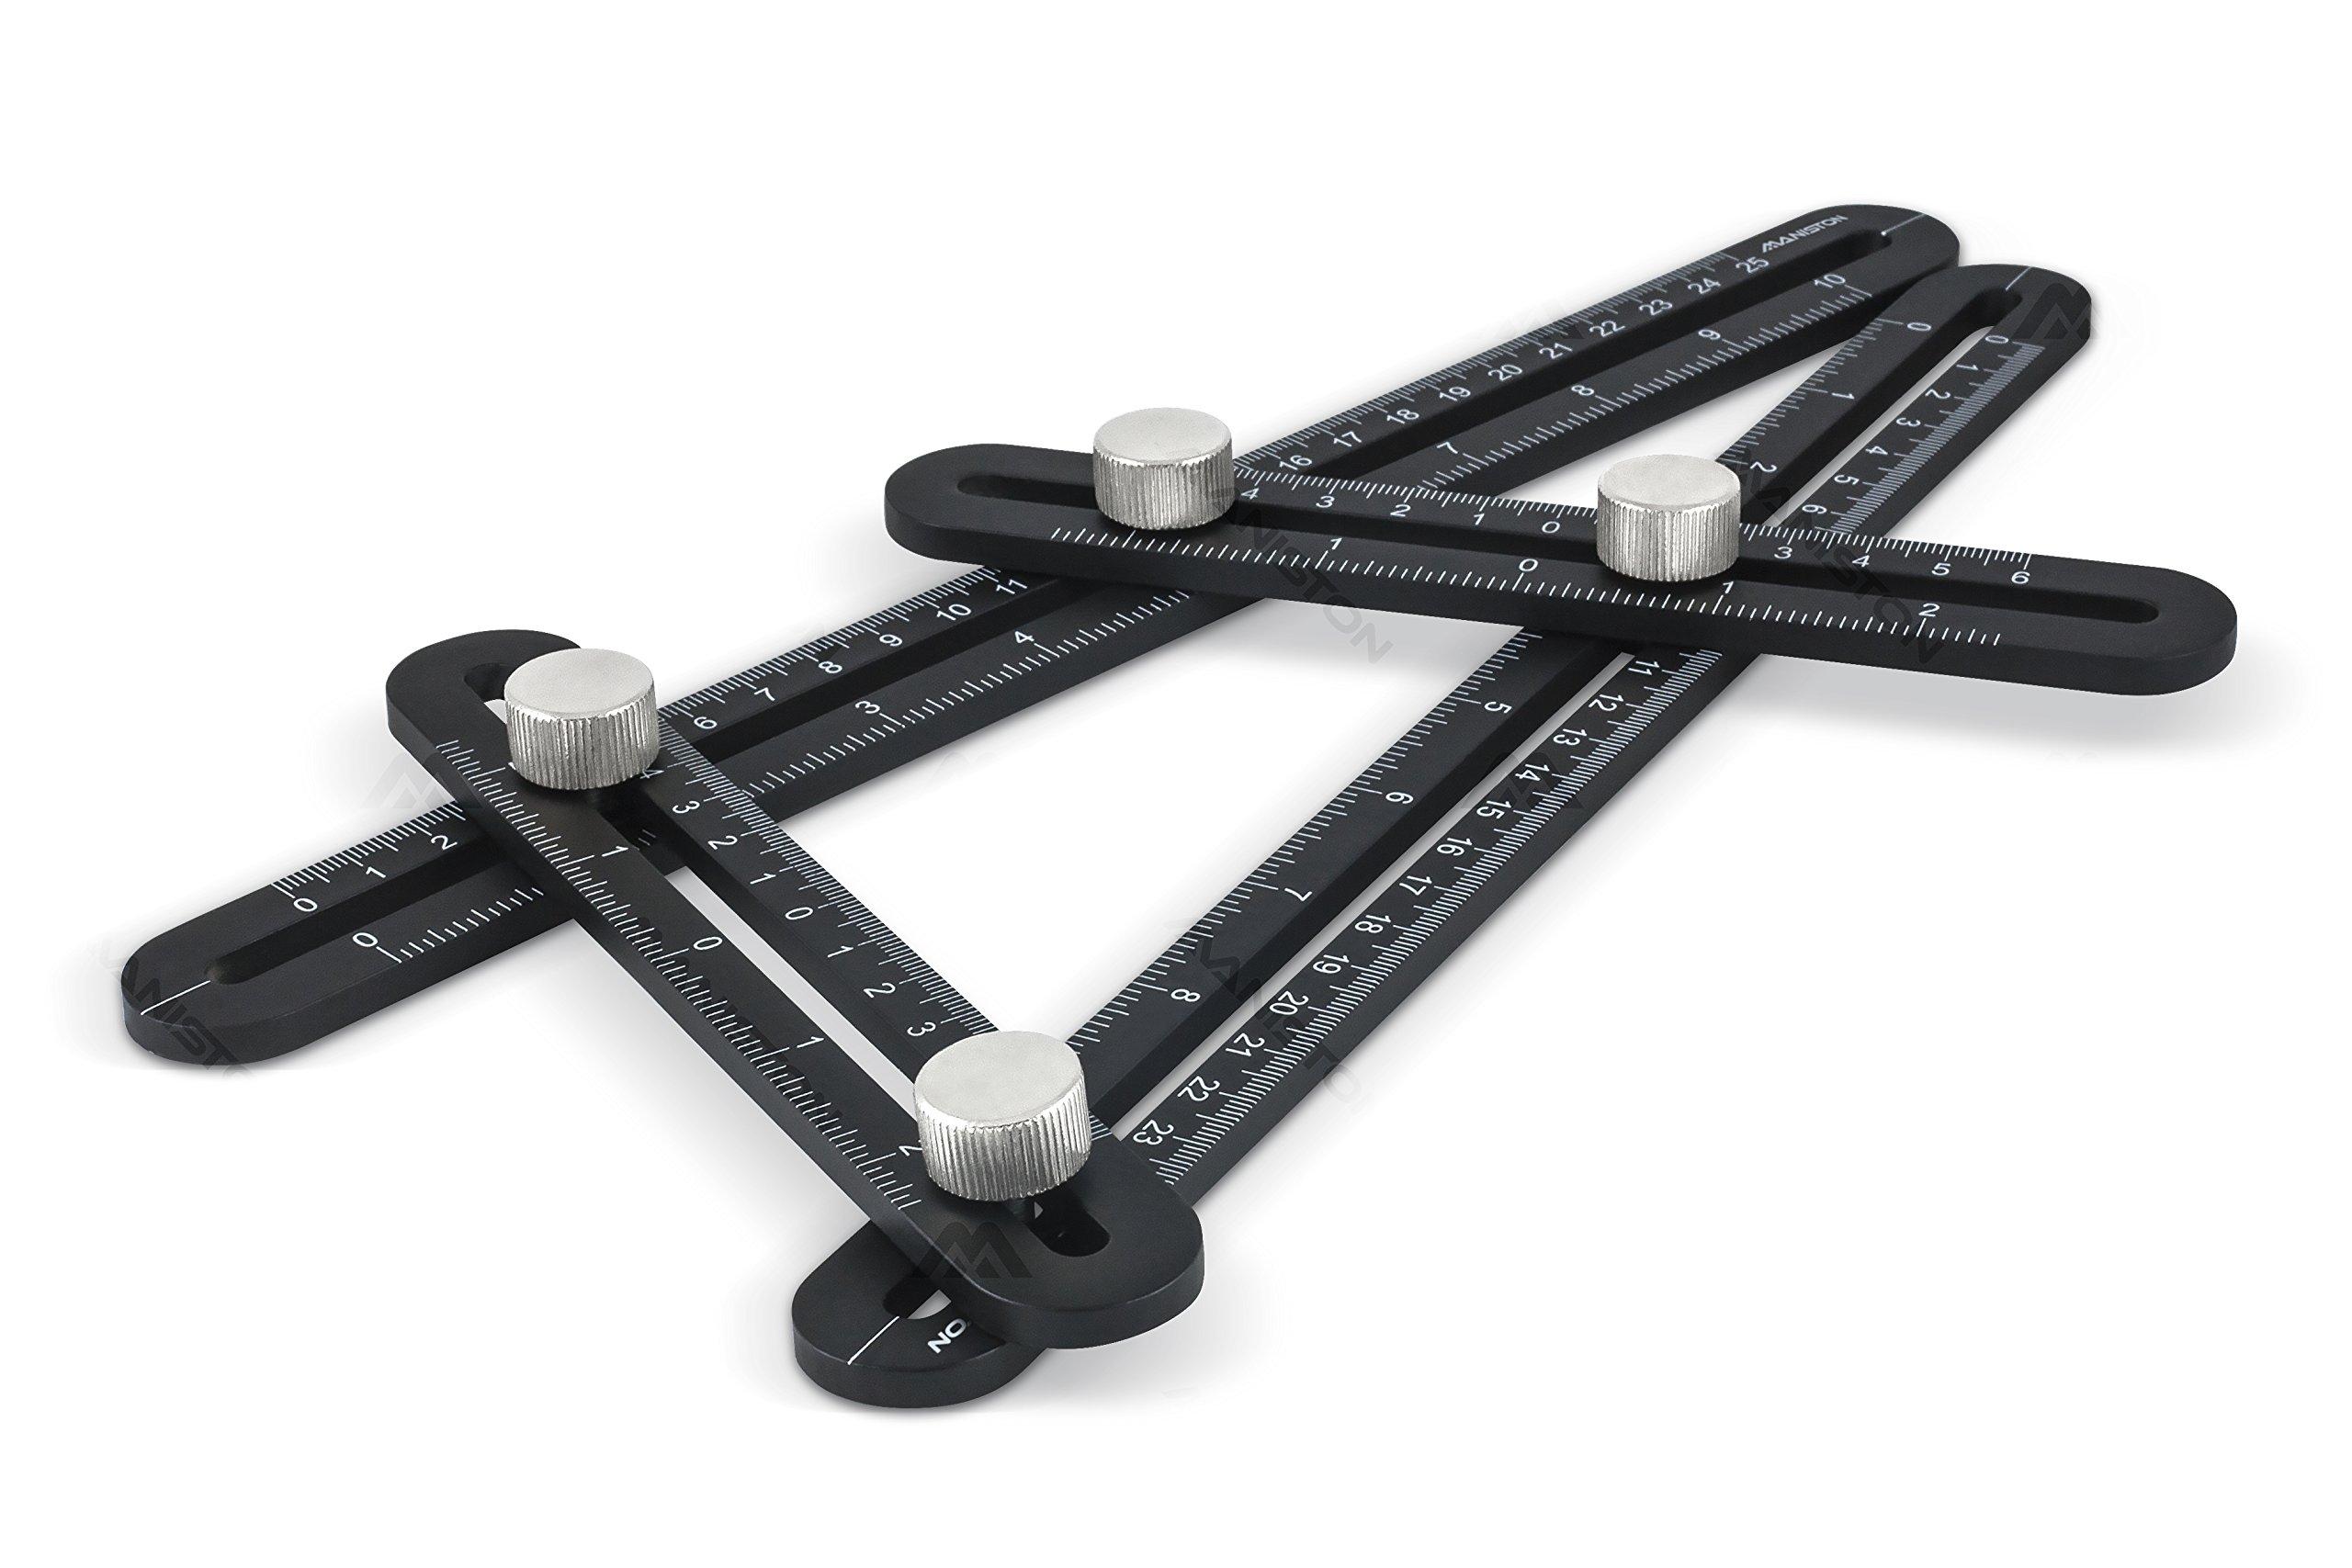 Premium Full Metal Angleizer Template Tool | Strong Aluminum Alloy Multi Angle Measuring Ruler | Precise Multi Angle Finder Template Tool Perfect for Builders, Woodworkers, Carpenters, DIYers & Tilers